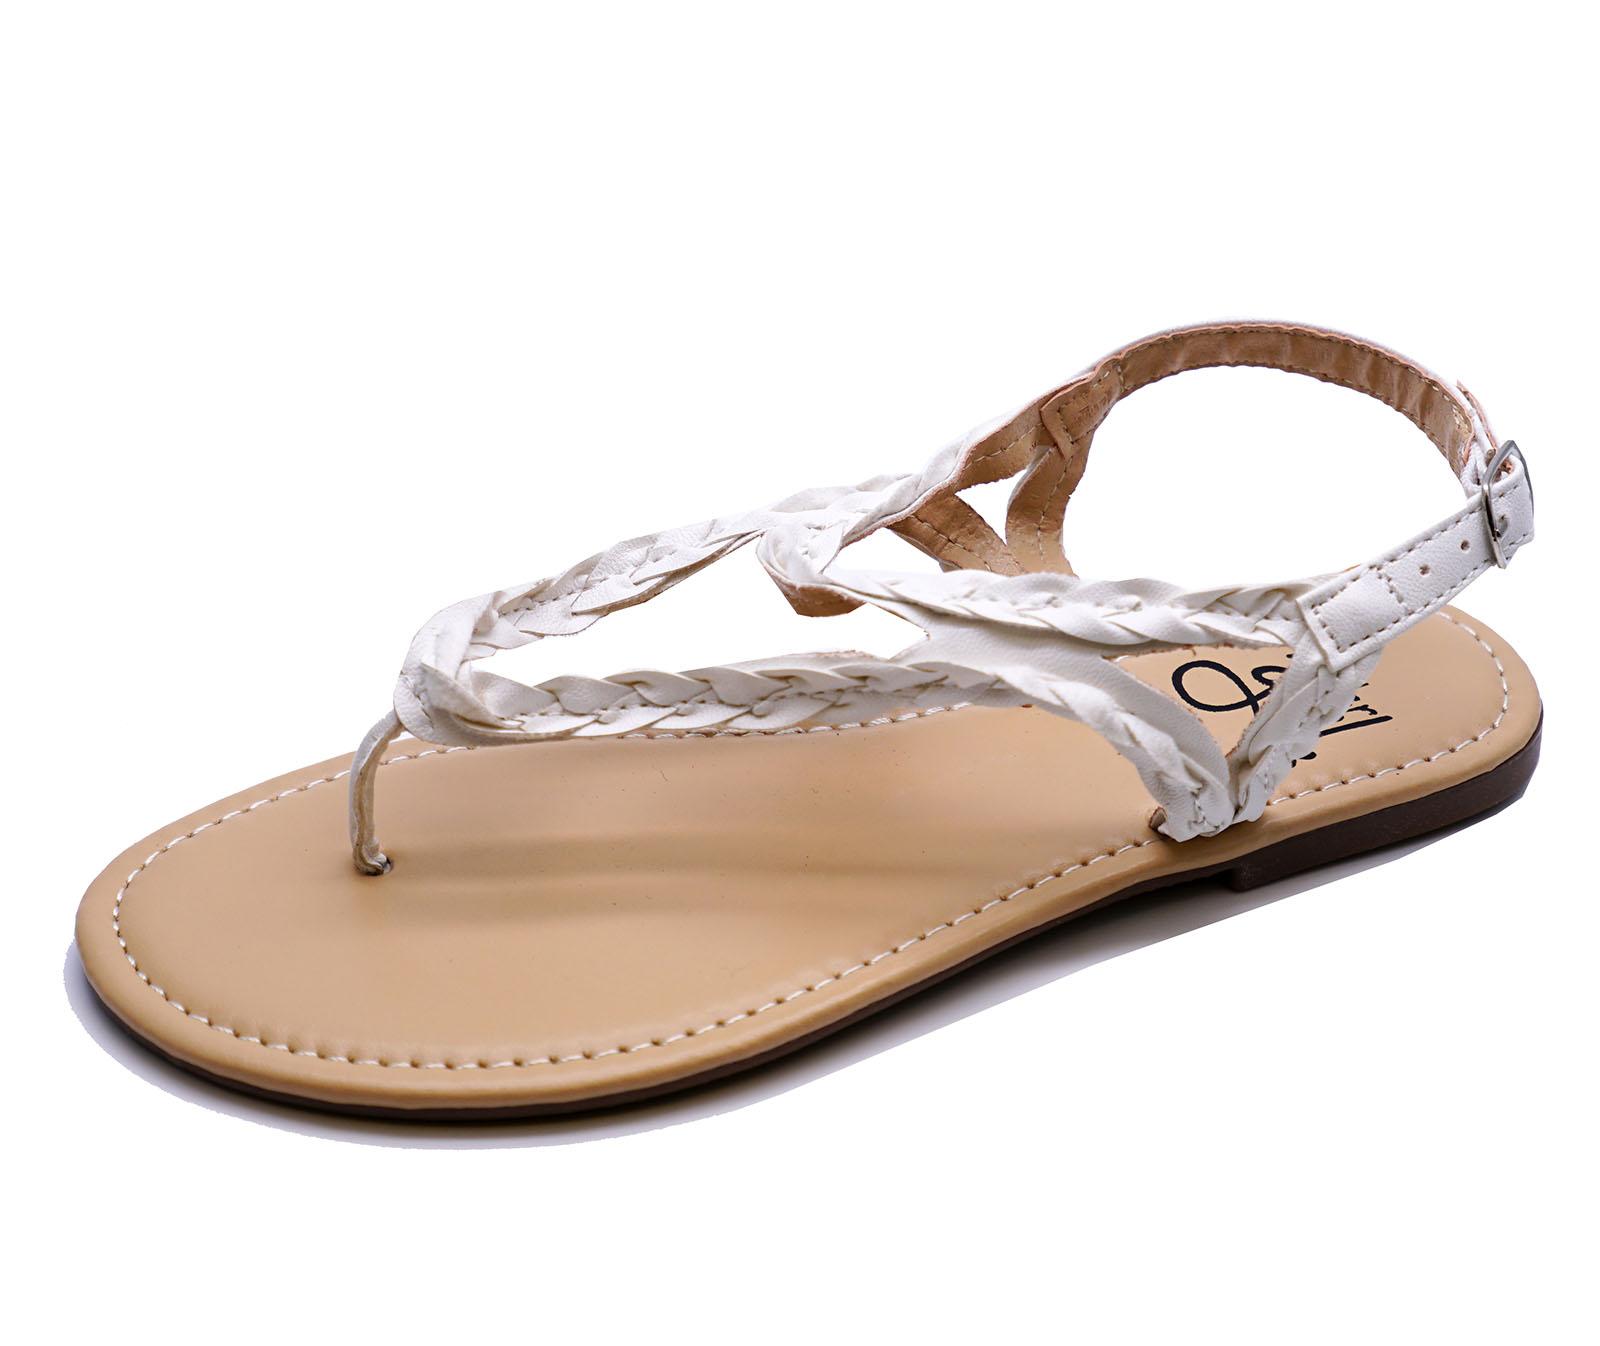 Filles-Enfants-Blanc-Tongs-Gladiator-SANDALES-ete-pointure-Chaussures-11-4